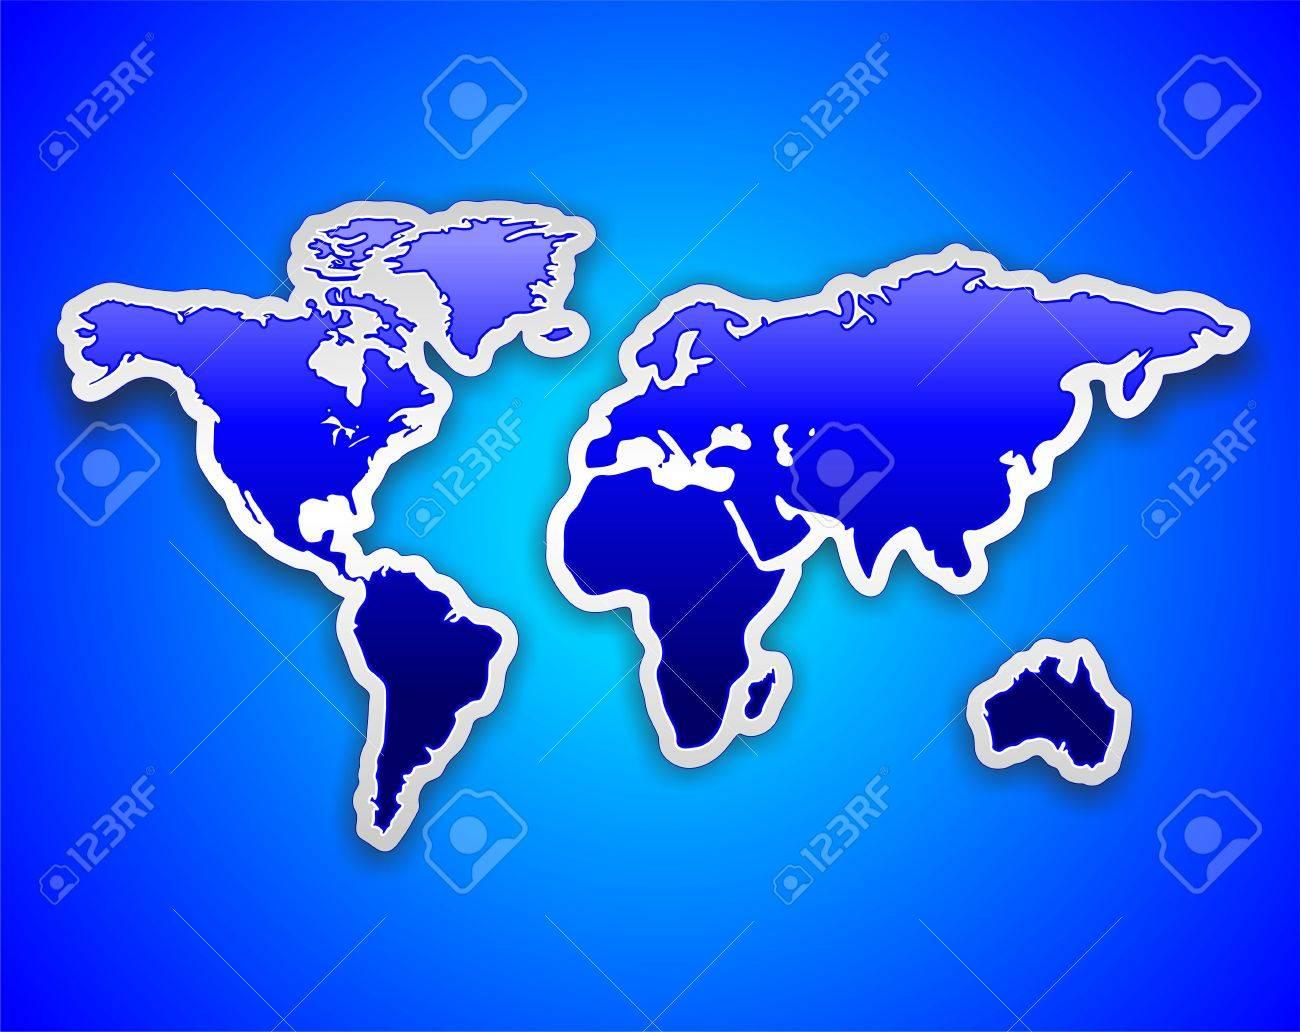 World map blue sticker on blue background royalty free cliparts vector world map blue sticker on blue background gumiabroncs Choice Image